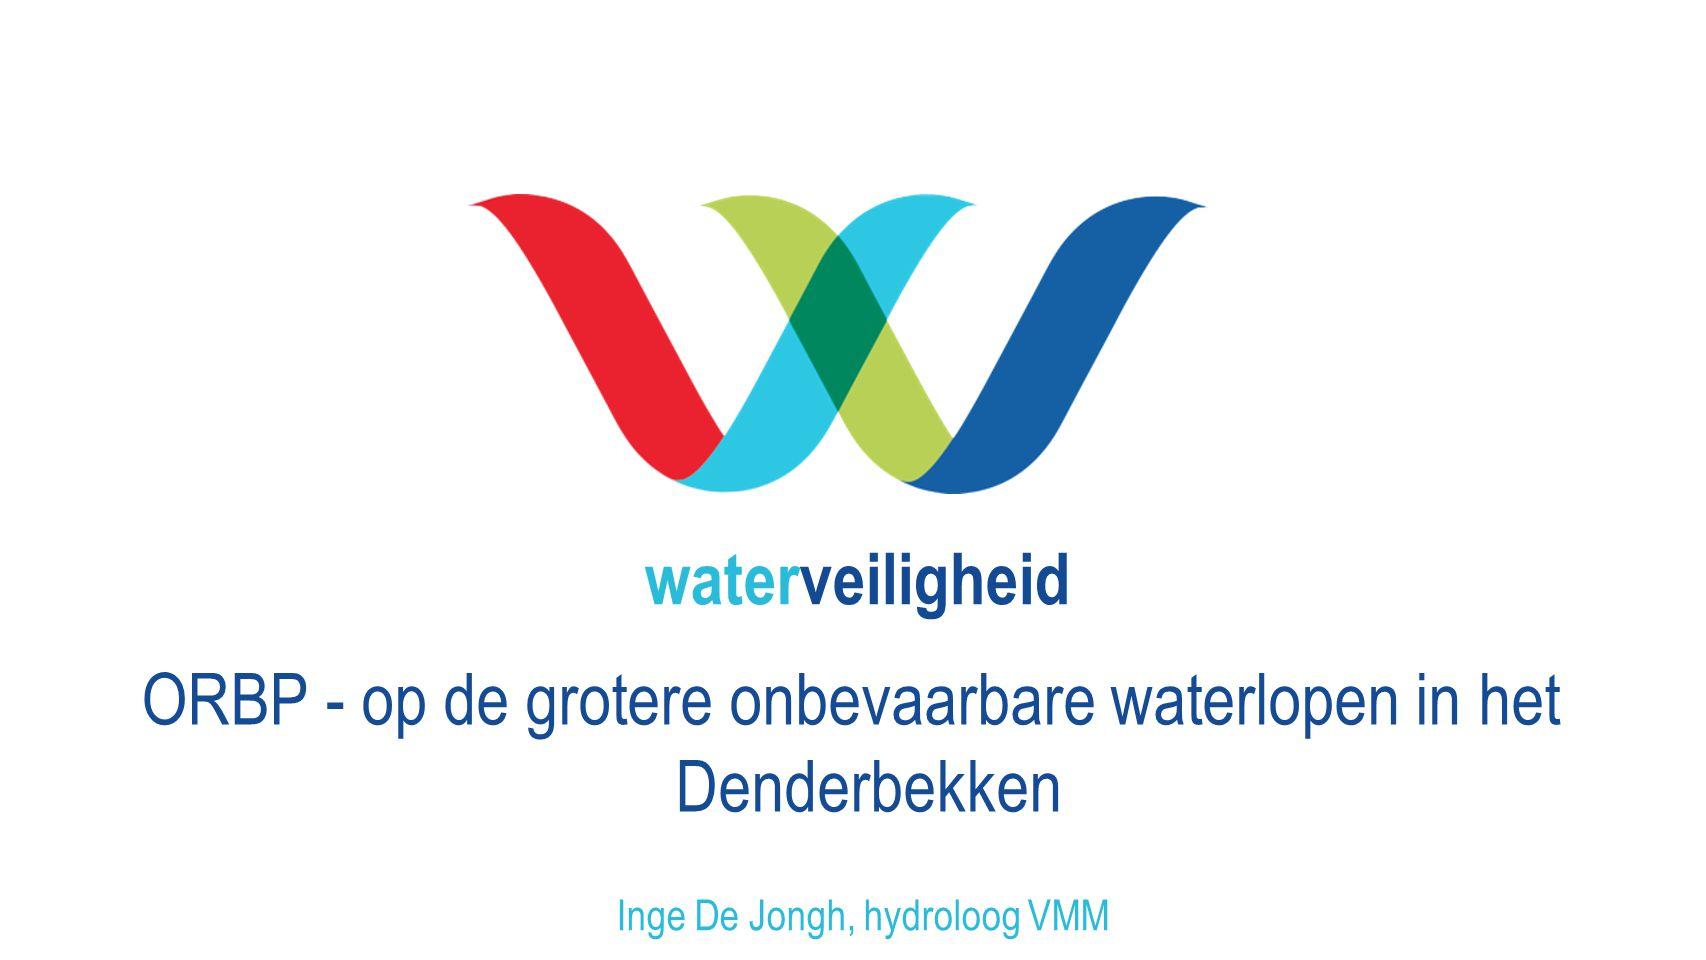 Inge De Jongh, hydroloog VMM